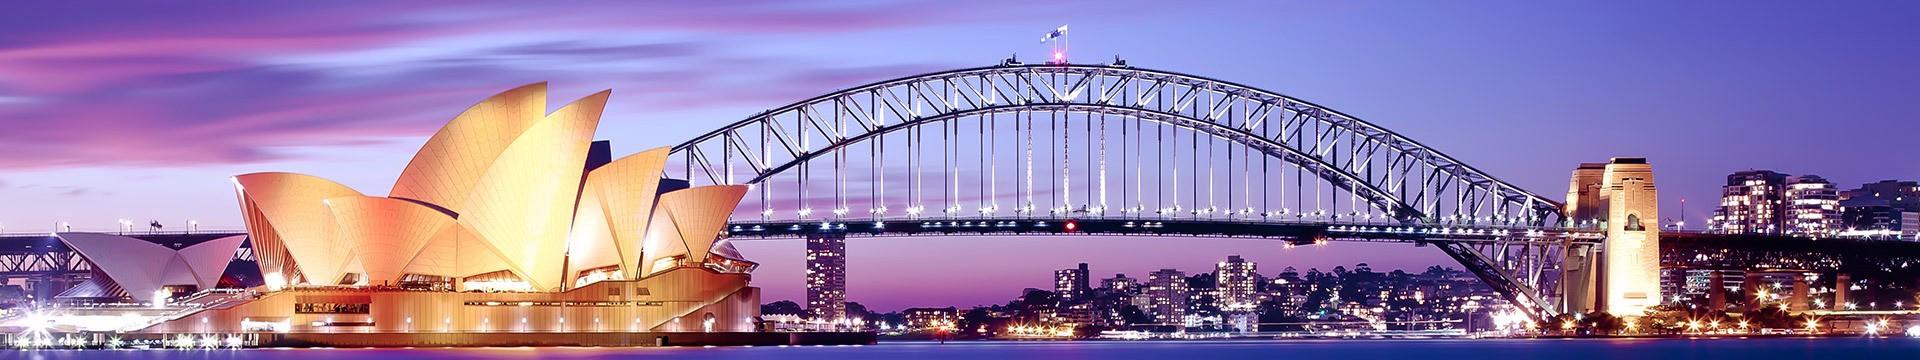 invitation letter for australibusiness visa%0A Australia visa application procedure Work Visa  India  Temporary Activity  Visa Subclass       VisaFolder com